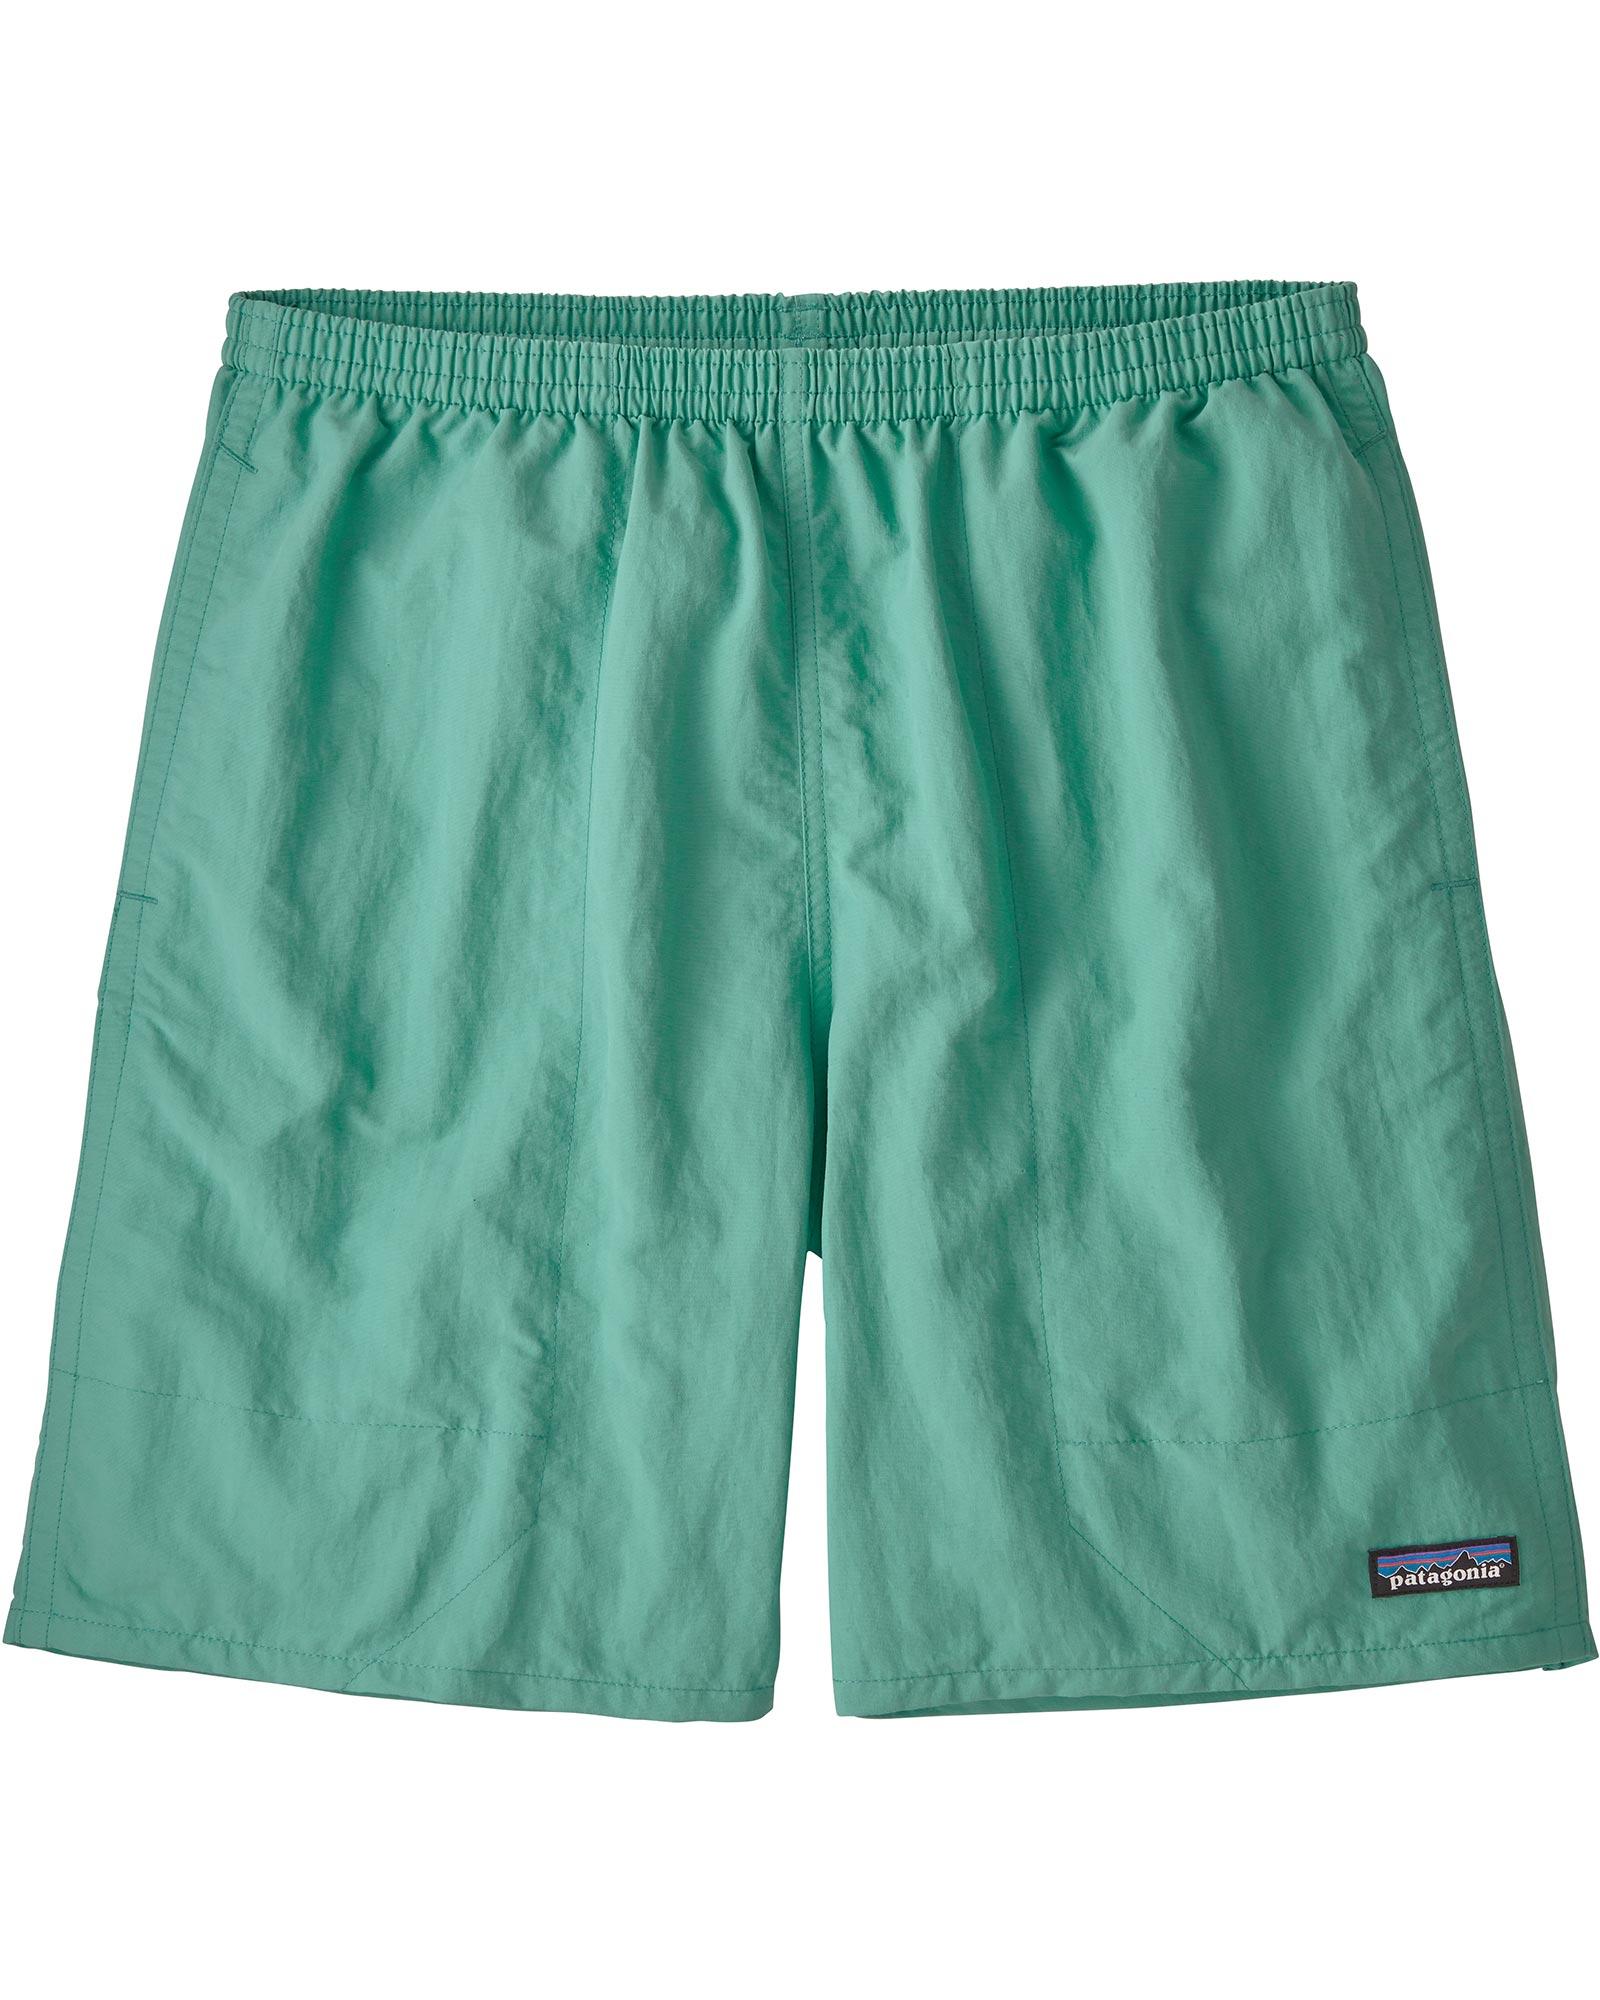 Product image of Patagonia Men's Baggies Shorts